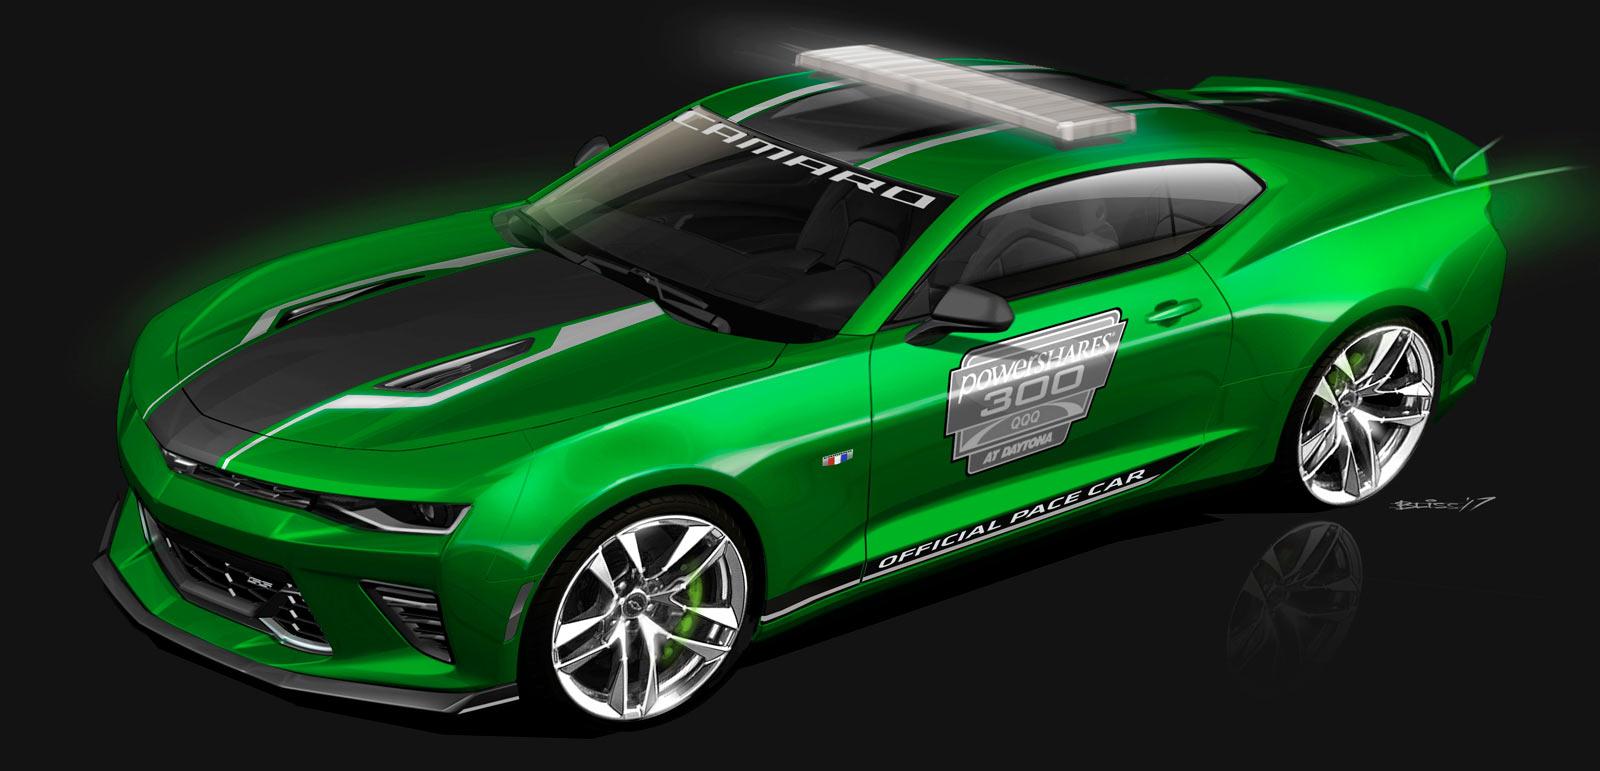 Camaro-SS-Pace-Car